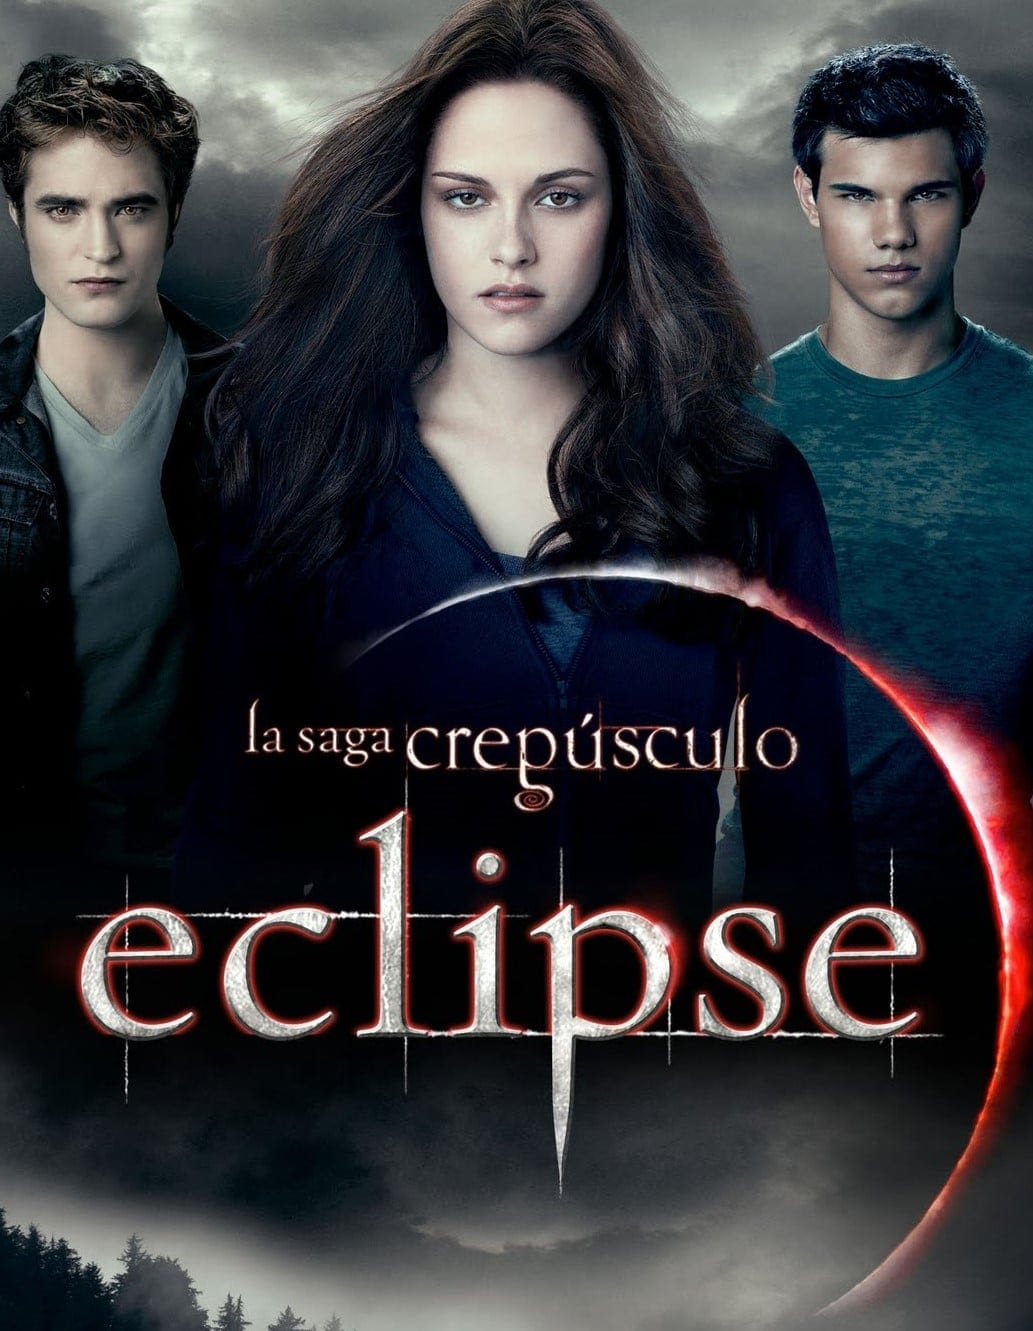 Eclipse - Crítica de cine